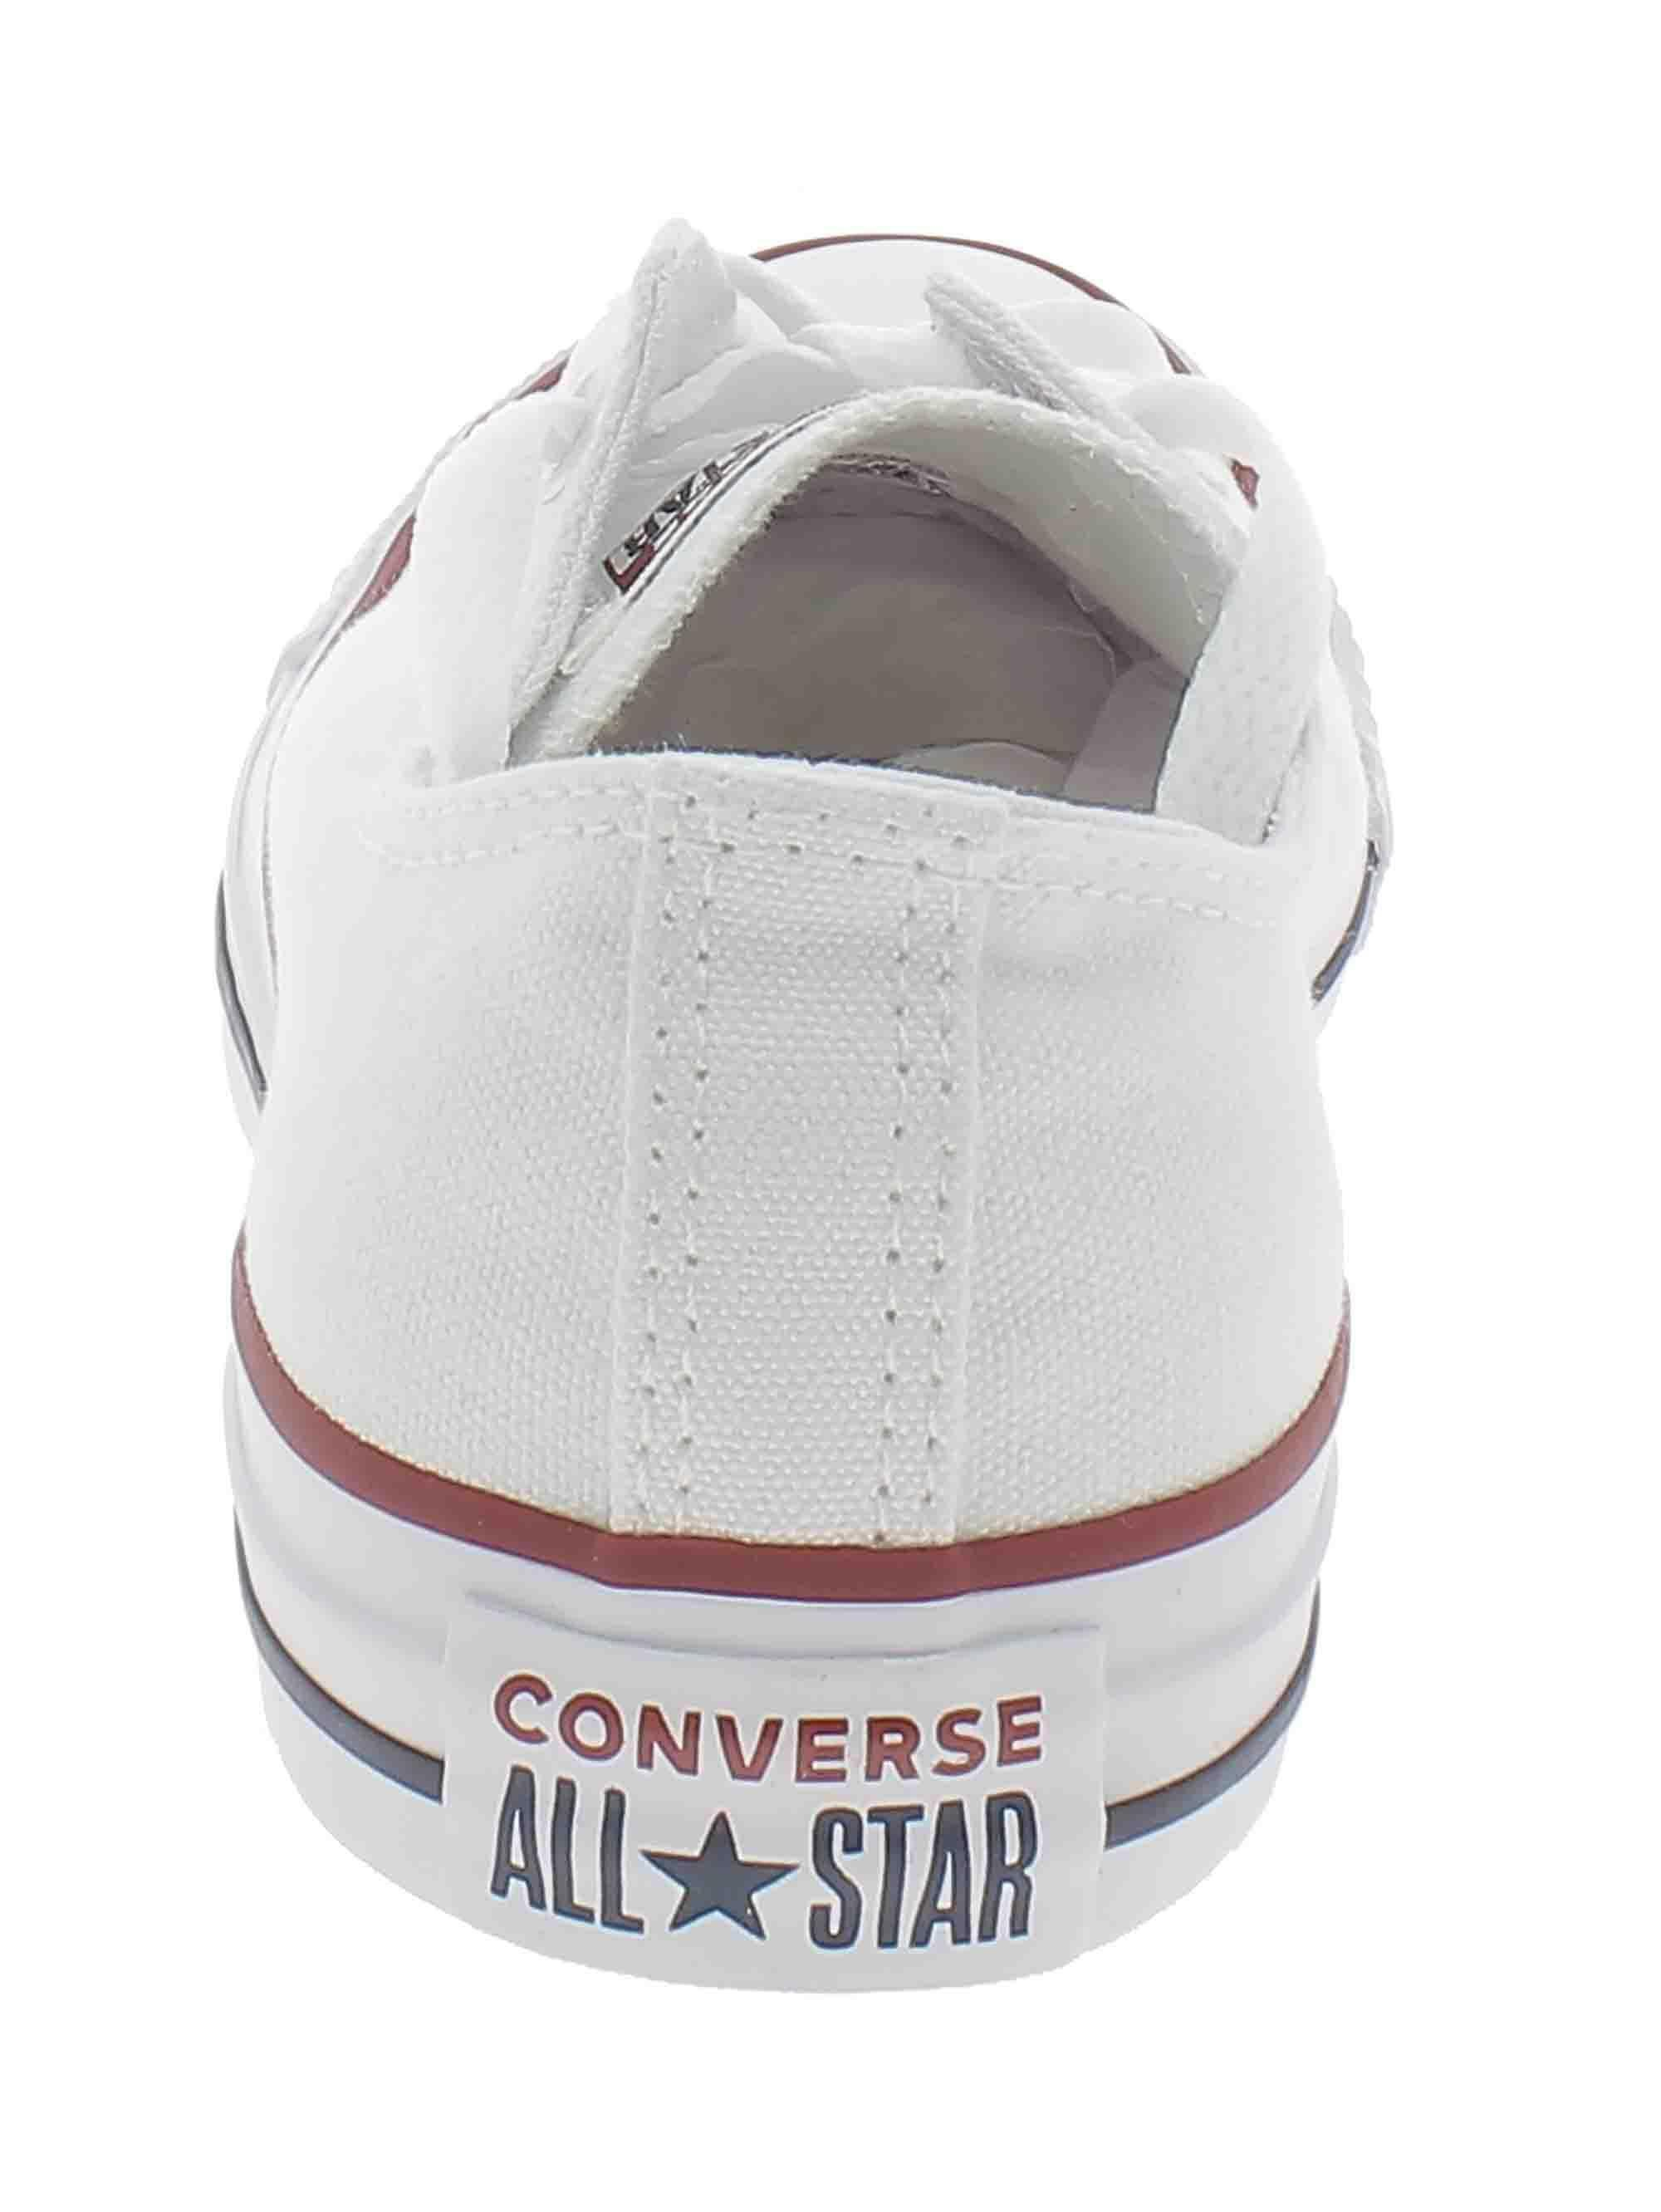 Converse Optical All Star Scarpe Ox Bianche Sportive M7652c Basse x4xrw17t